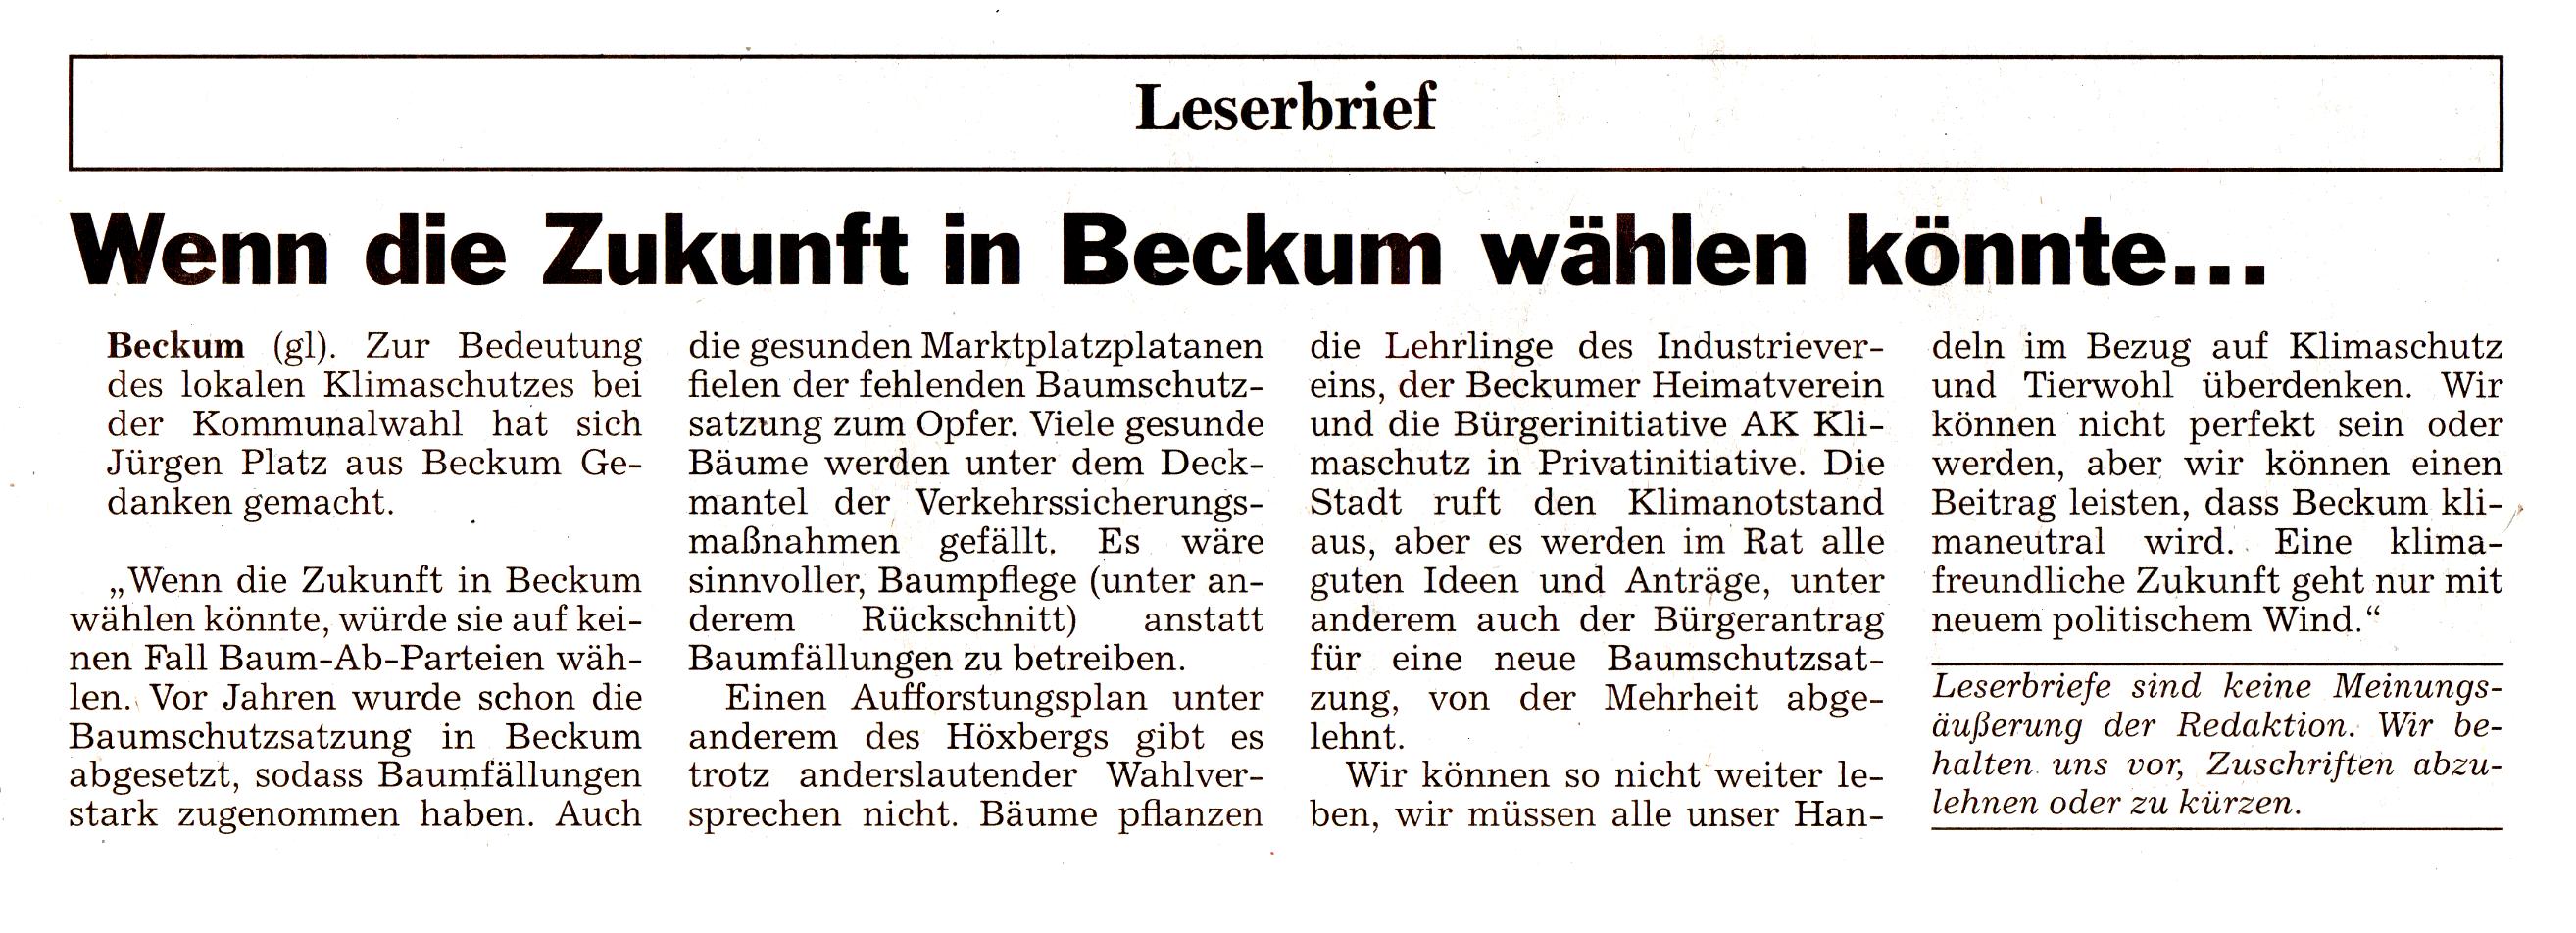 Beckumer-Marktplatz_Leserbrief_Jürgen-Platz